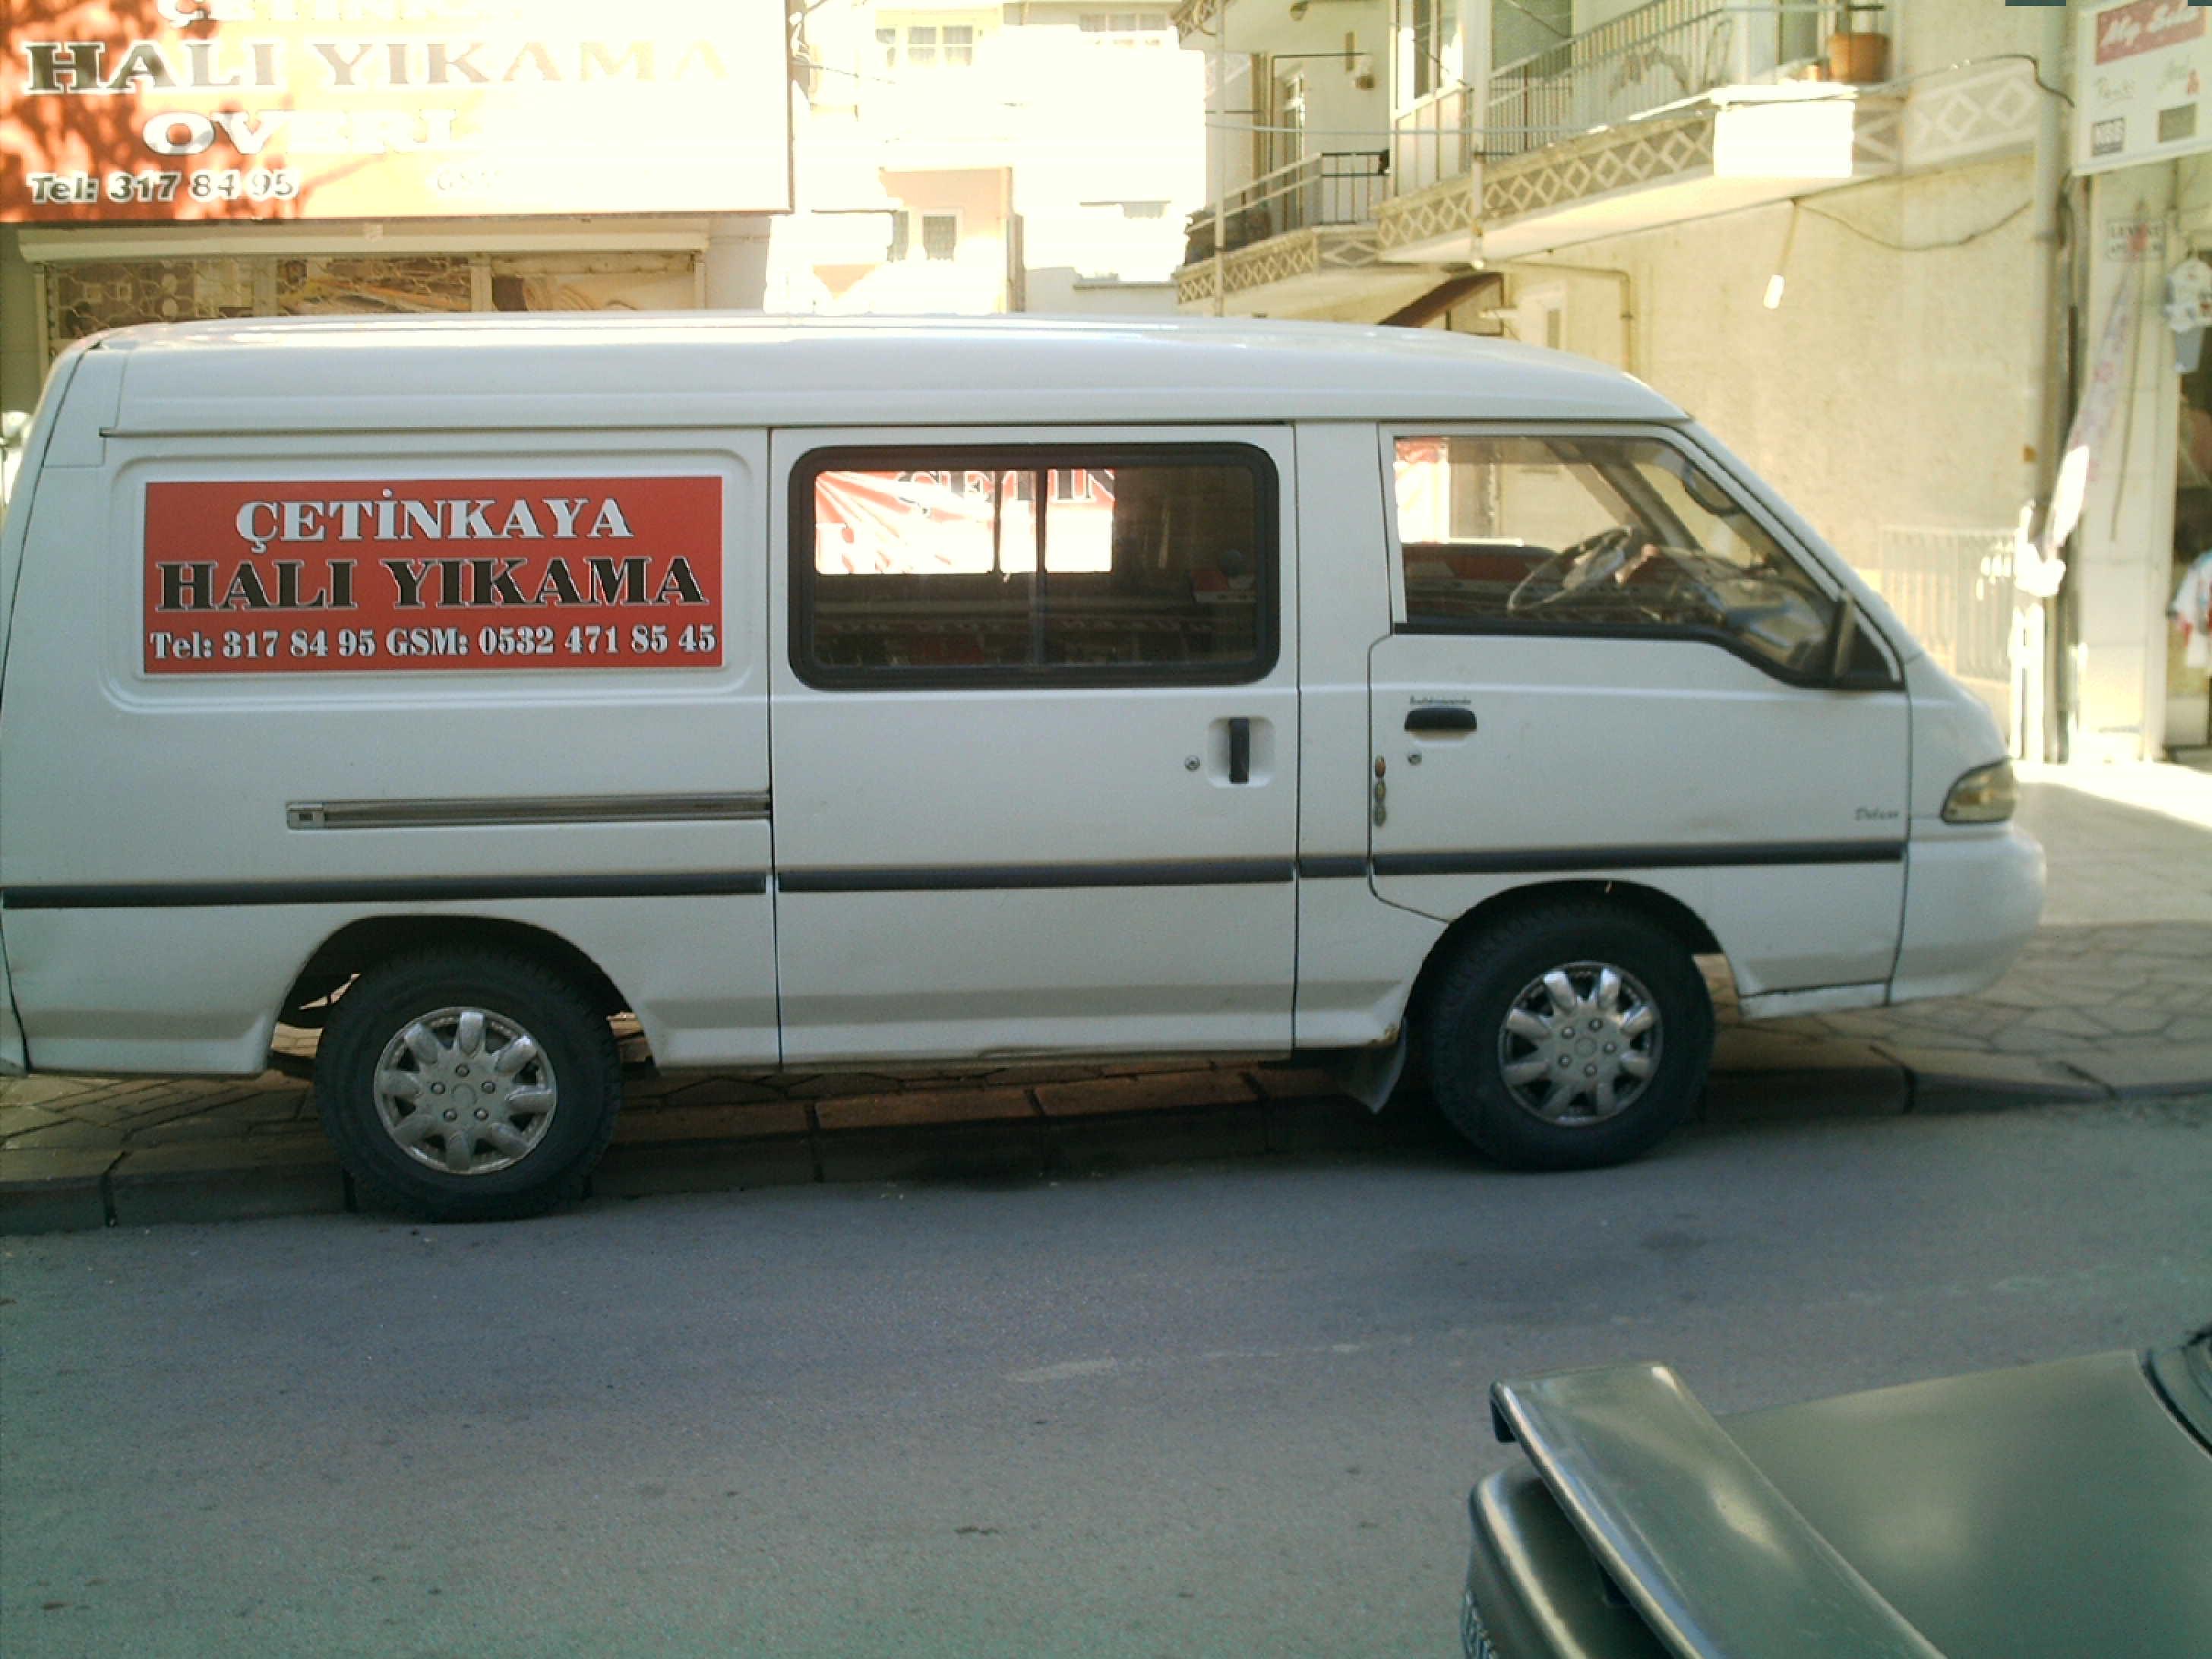 eryaman_hali_yikama_servis_araci